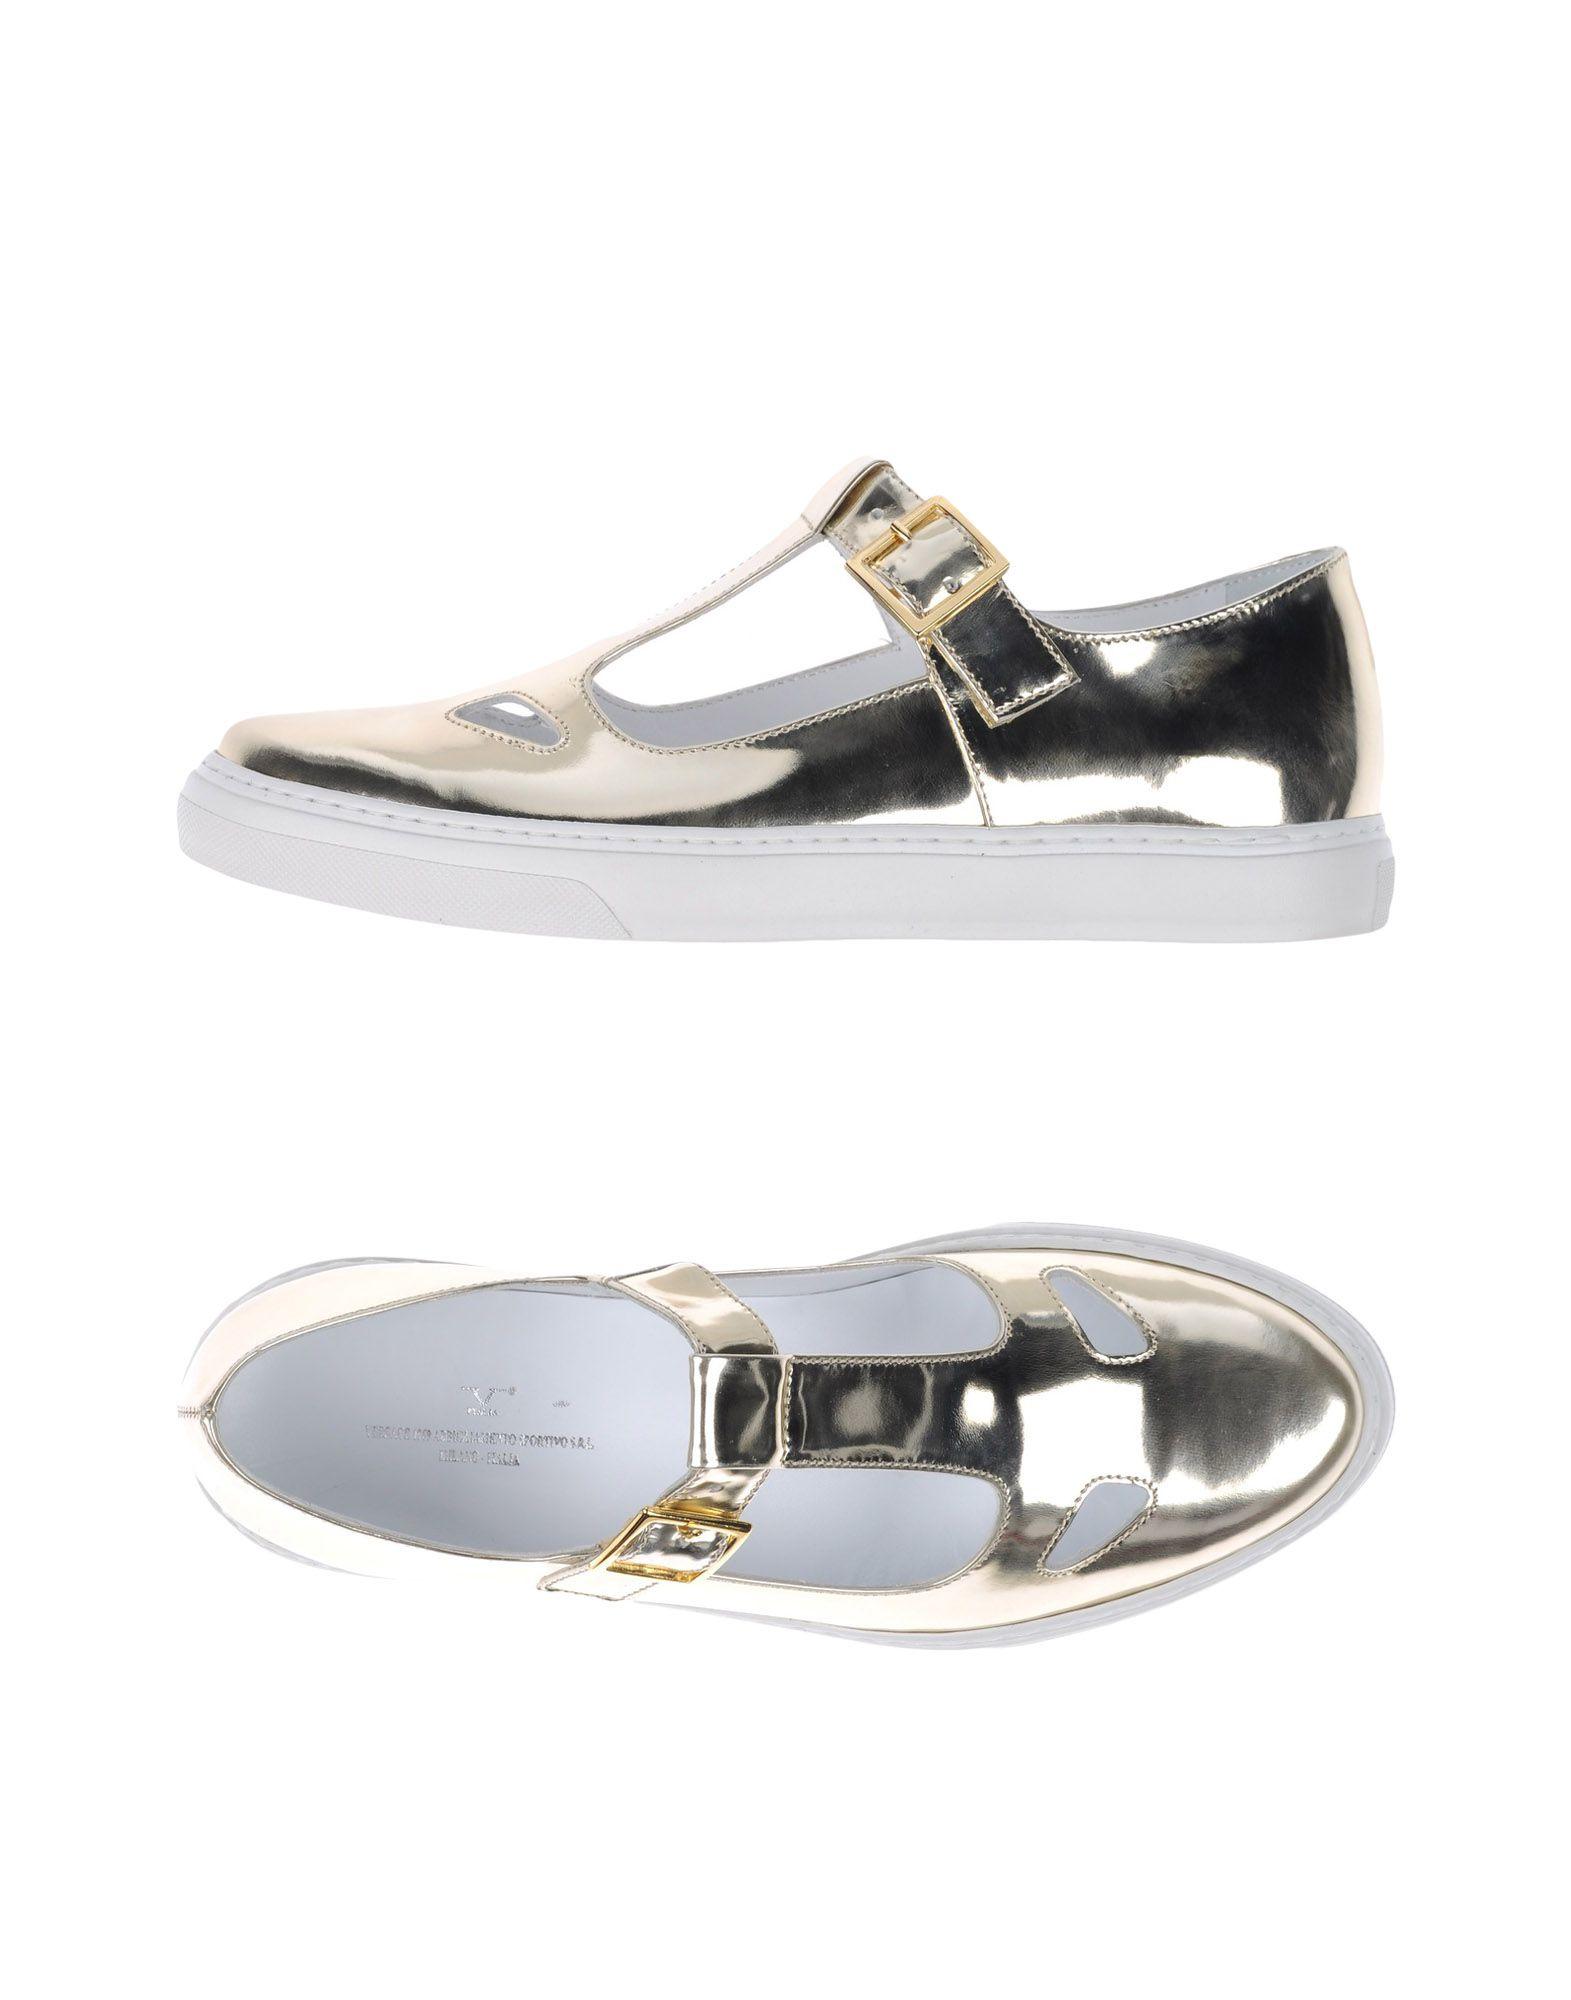 Gut Italia um billige Schuhe zu tragenV Italia Gut Mokassins Damen  11171109UI 76fcb0